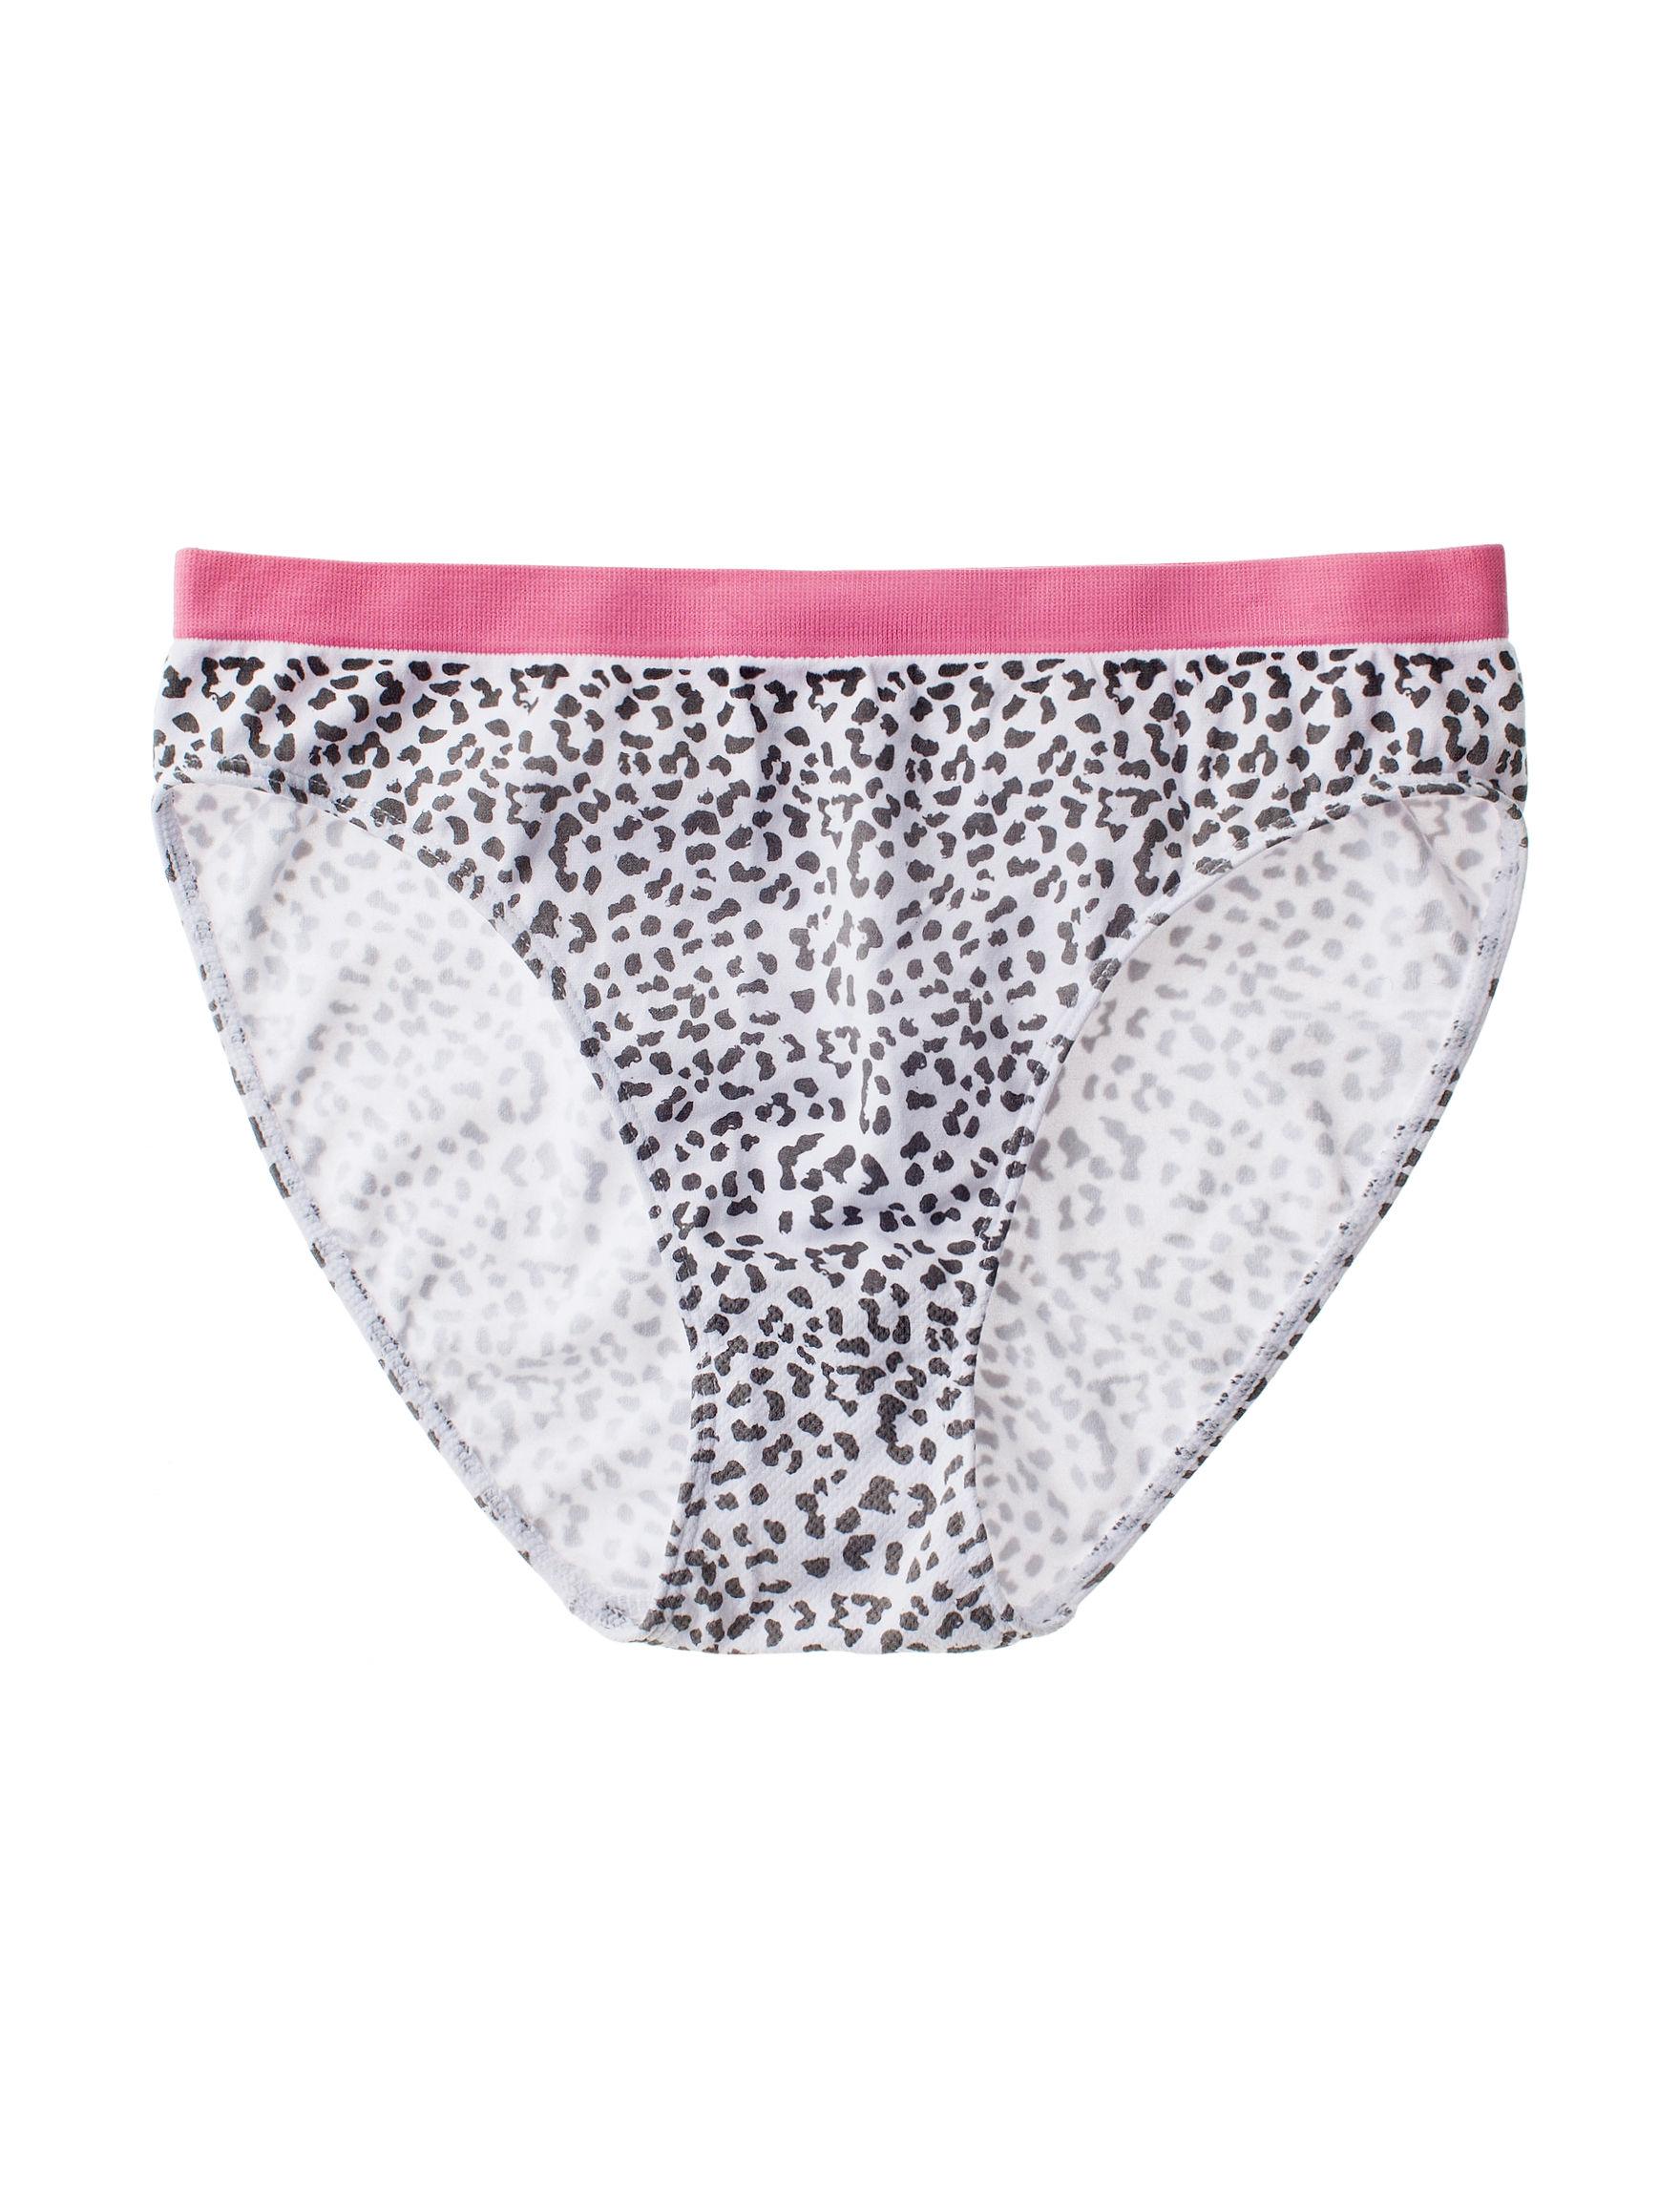 Rene Rofe Animal Print Panties High Cut